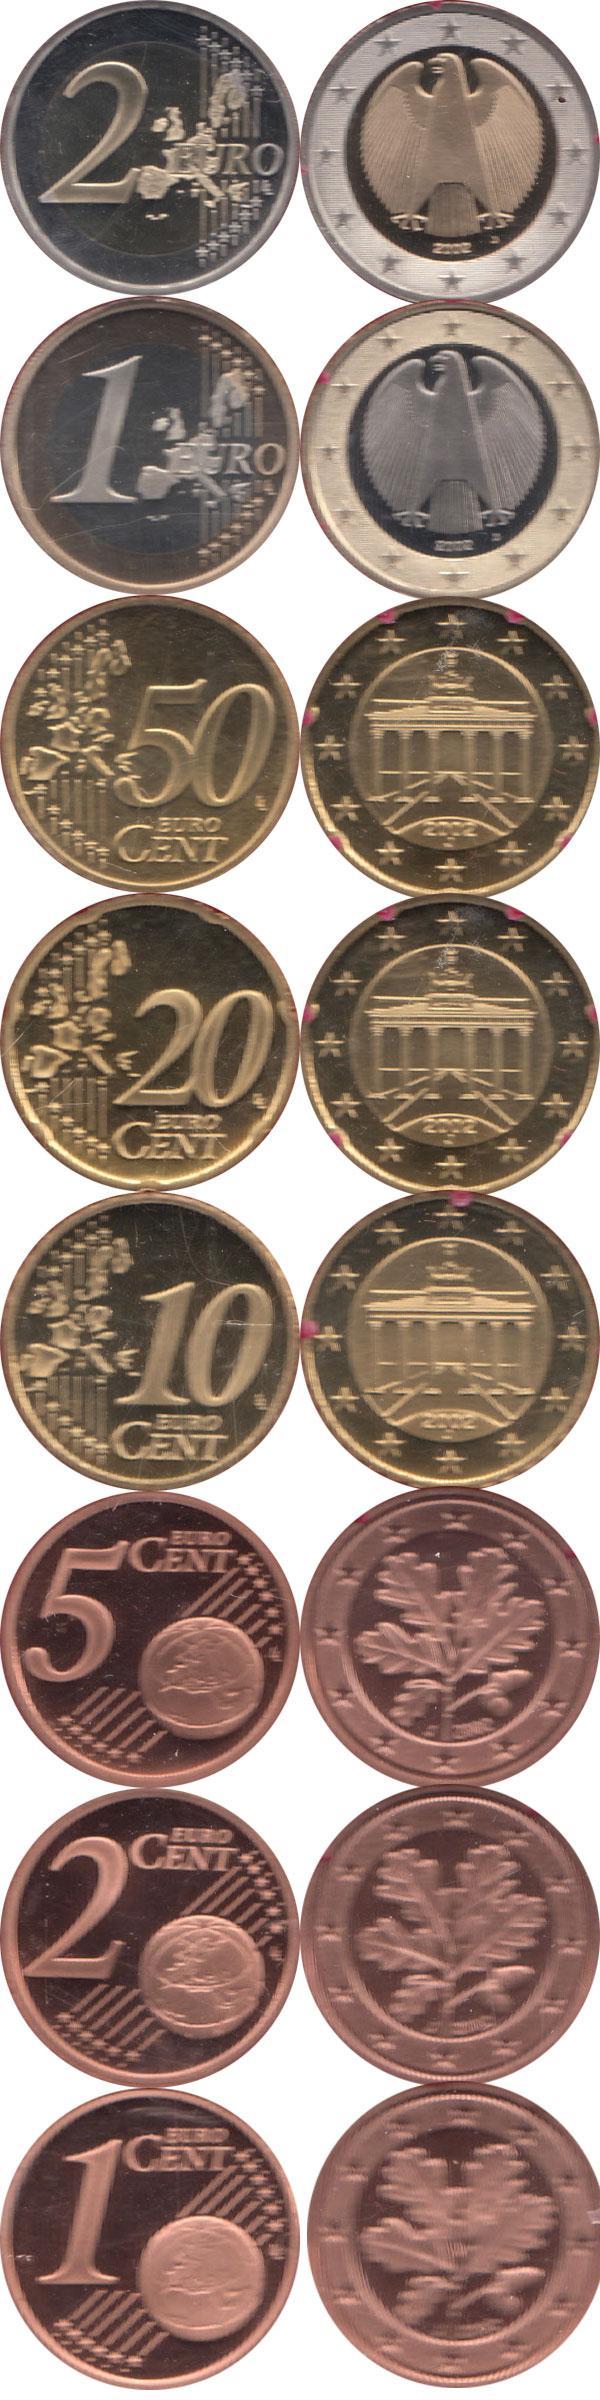 Каталог монет - Германия Евронабор 2002, Чеканка Гамбурга